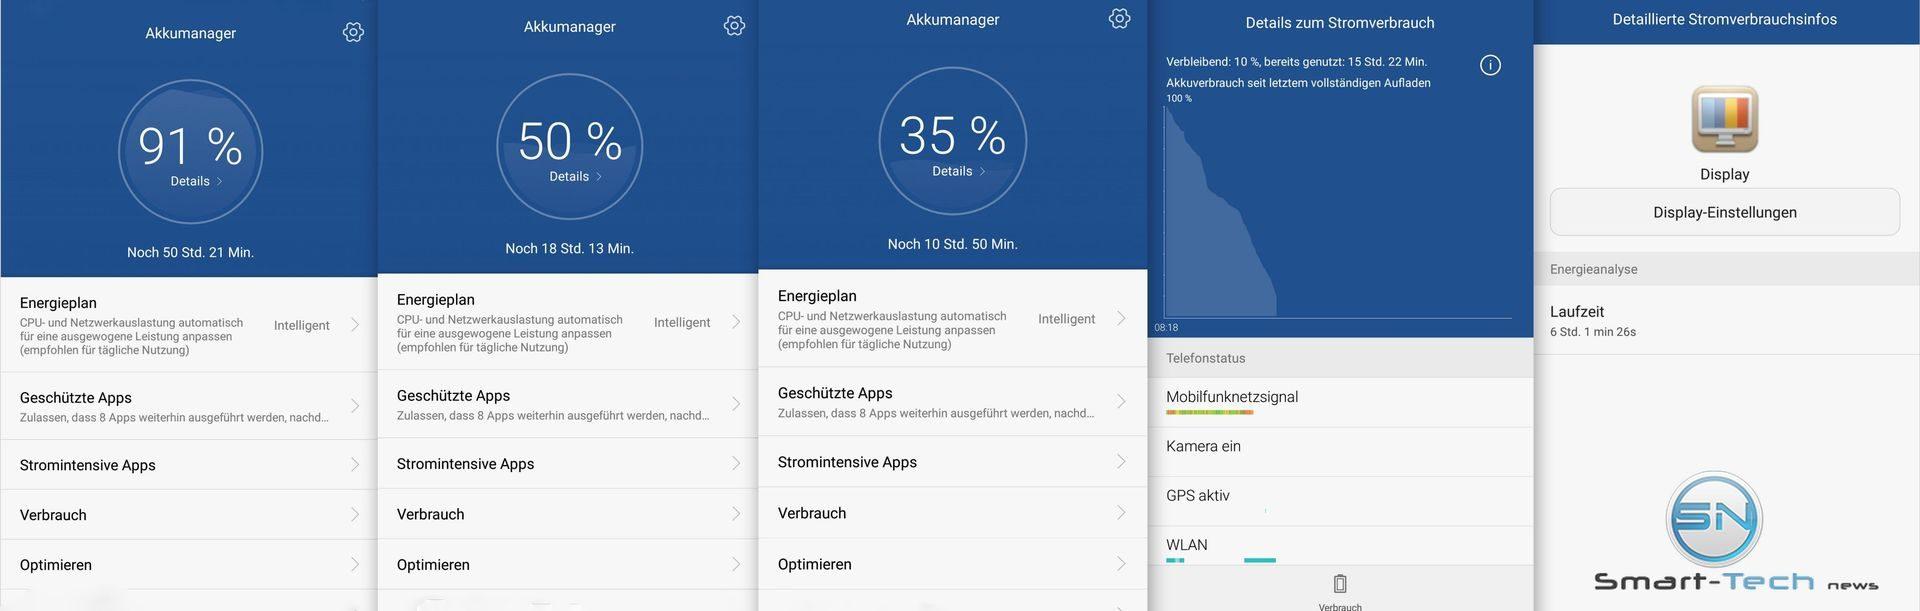 akkulaufzeit-huawei-nova-smarttechnews